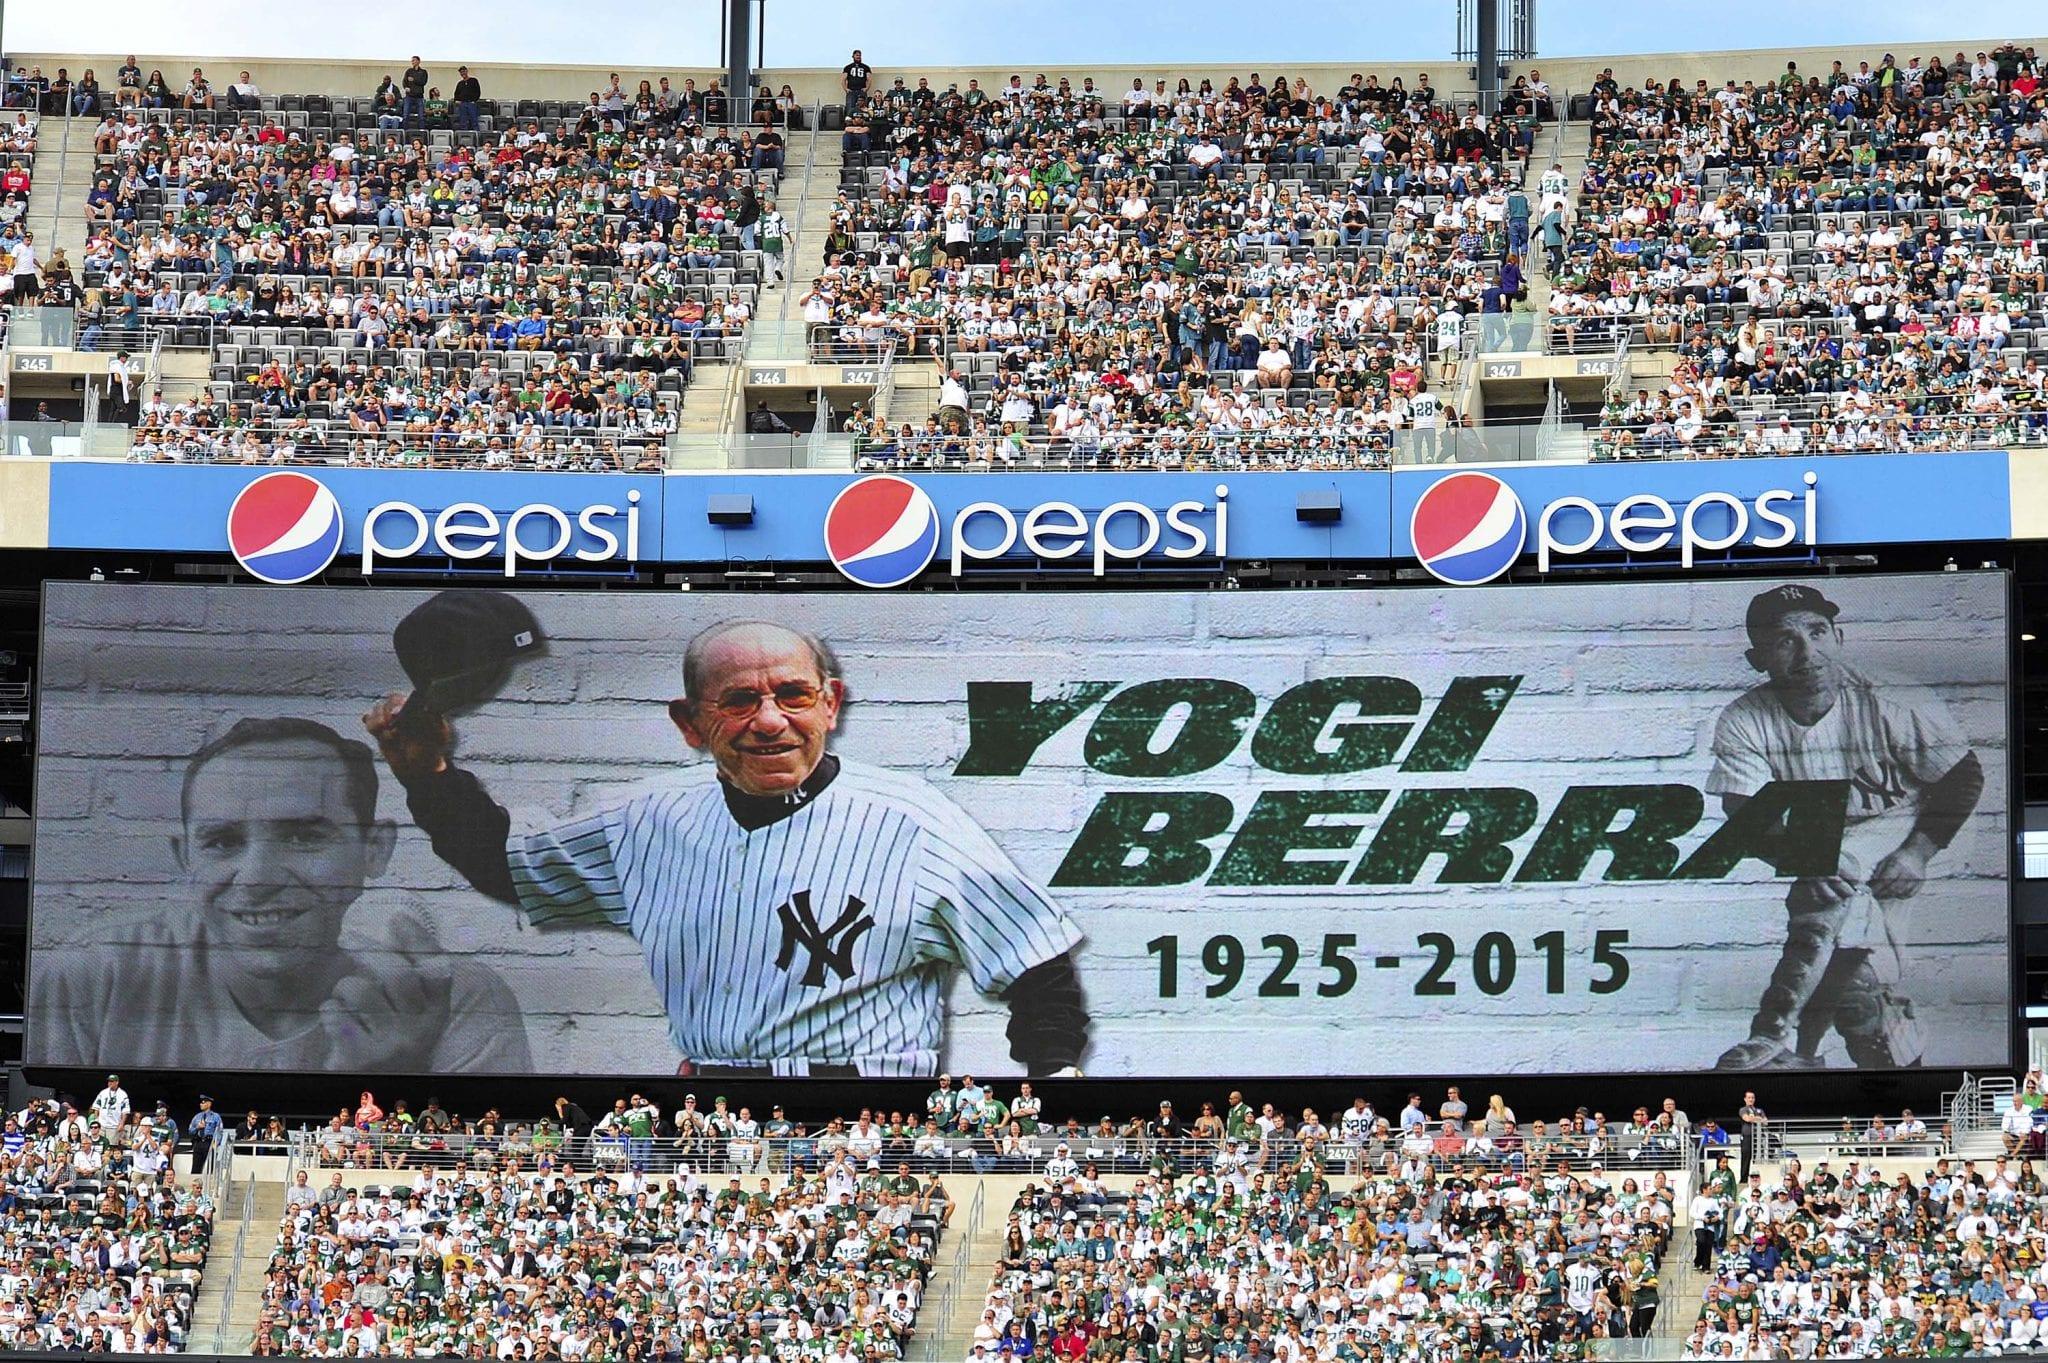 New York Yankees, Yogi Berra